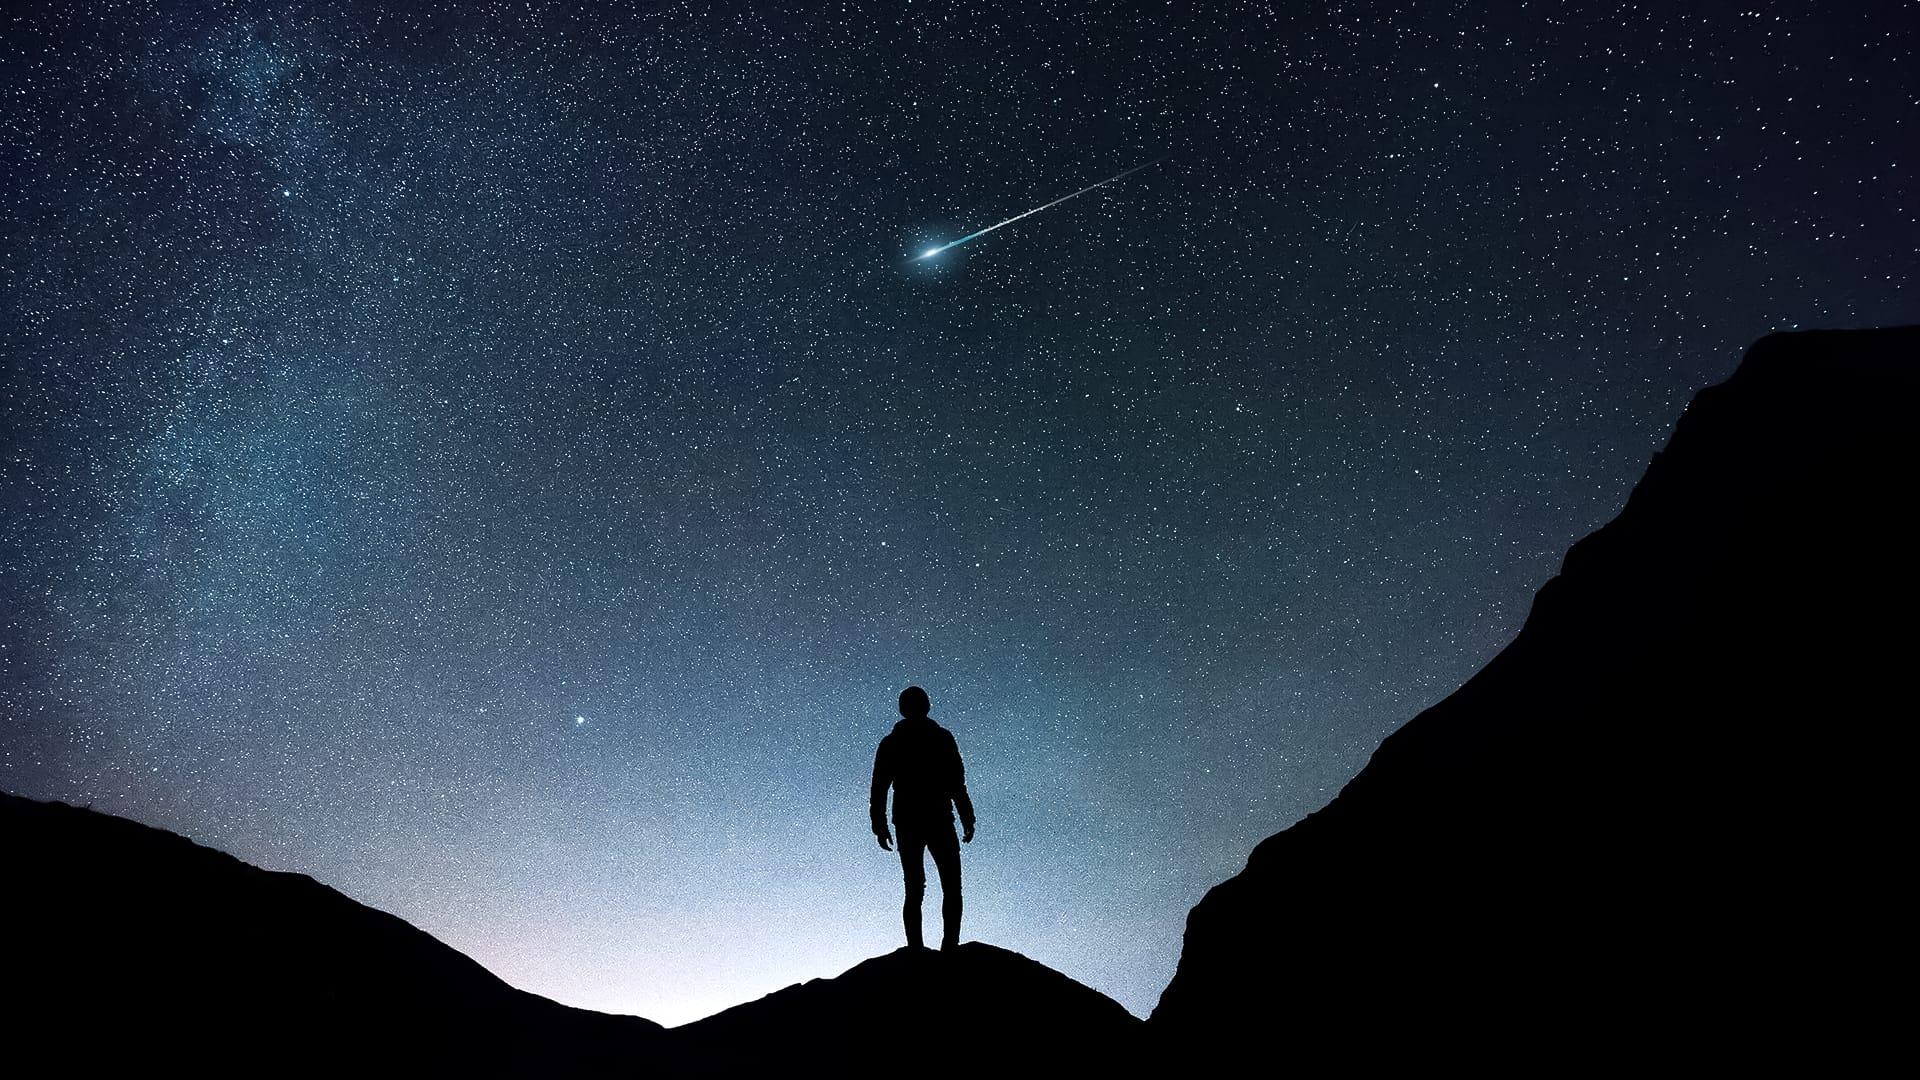 Man watching the night sky